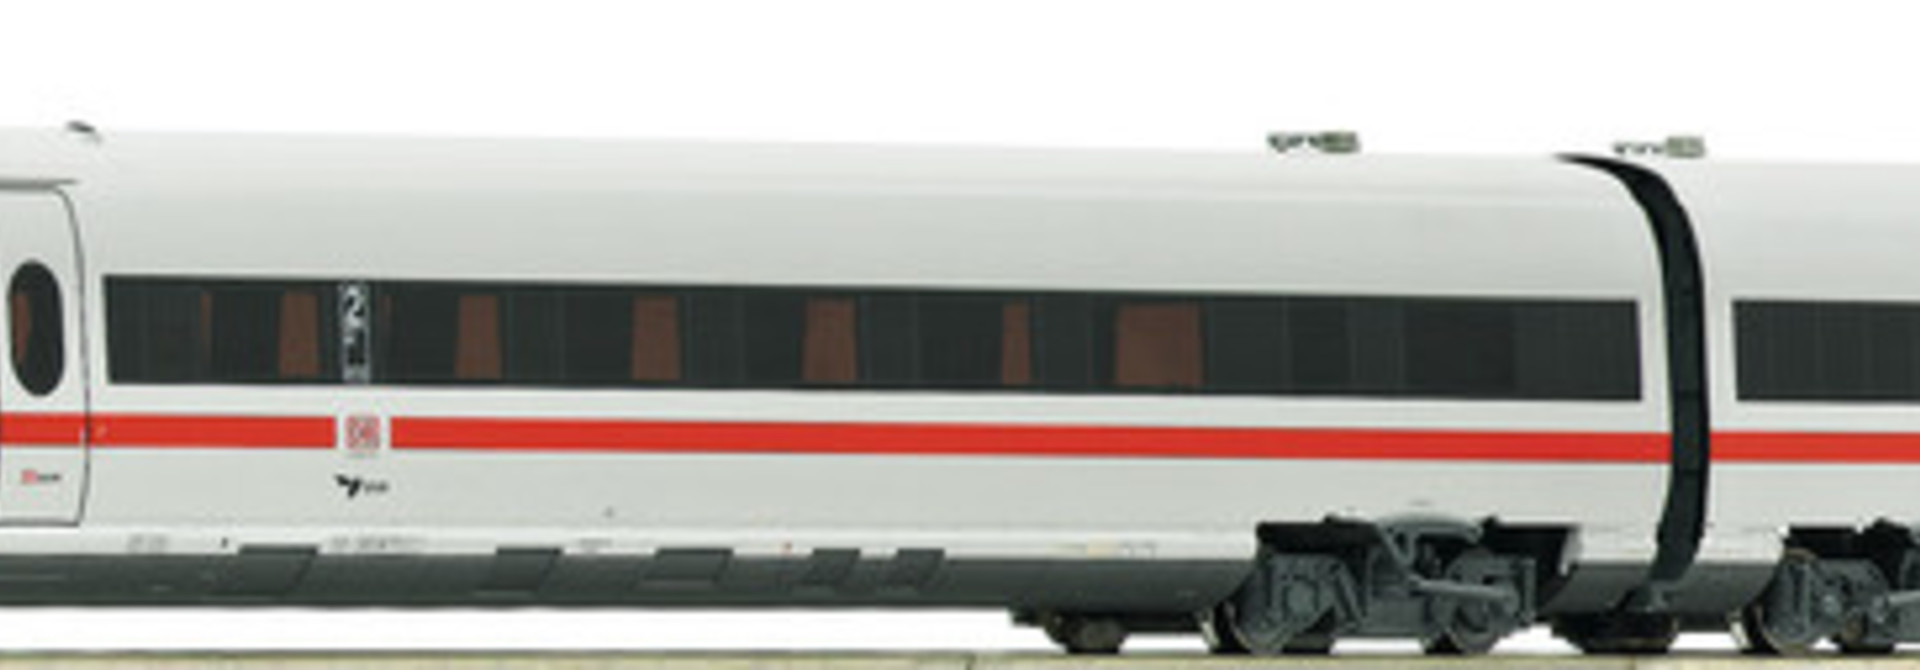 72106 Dieseltriebzug BR 605 DSB Snd.